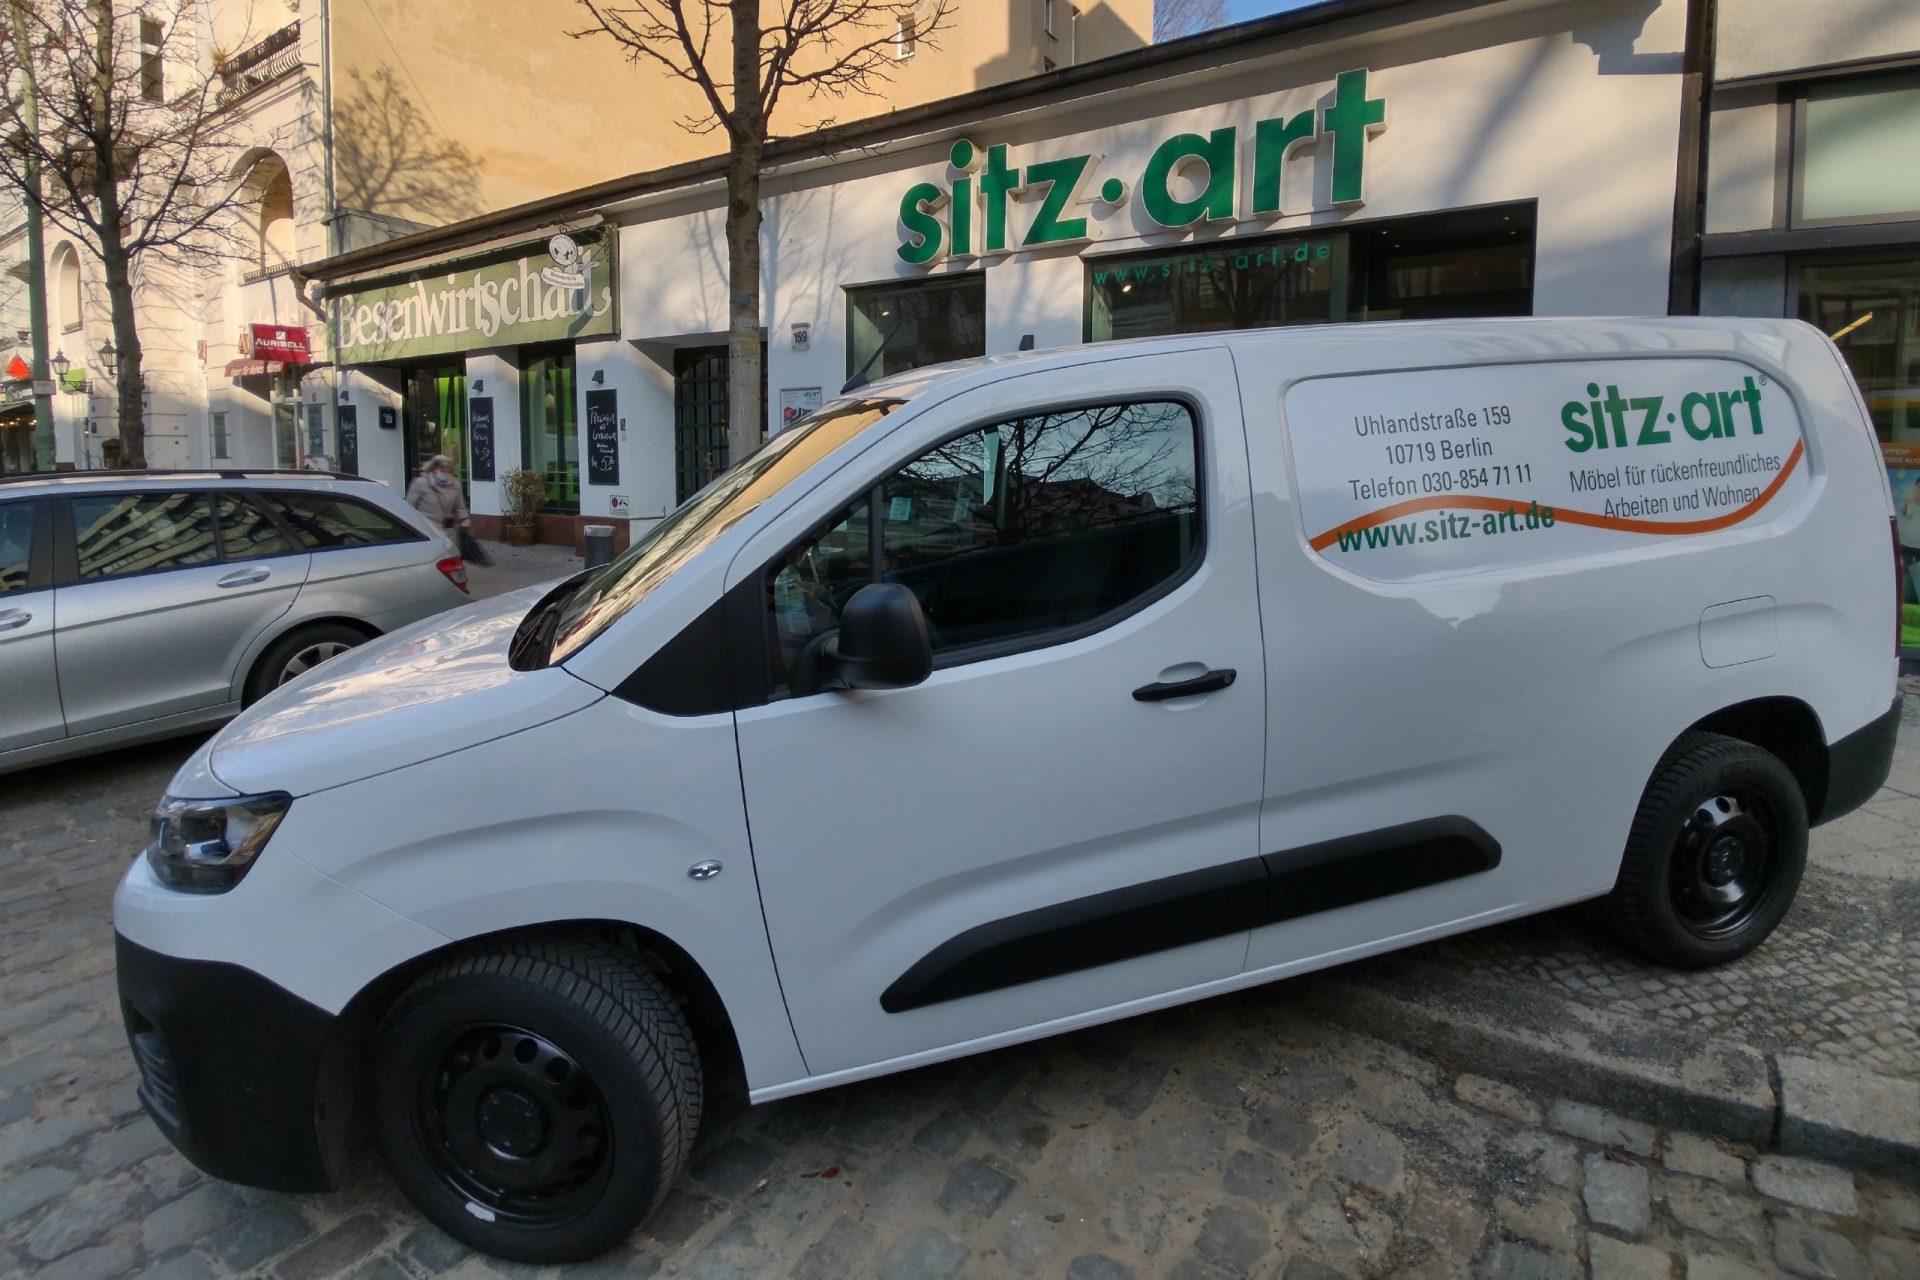 sitz-art Berlin